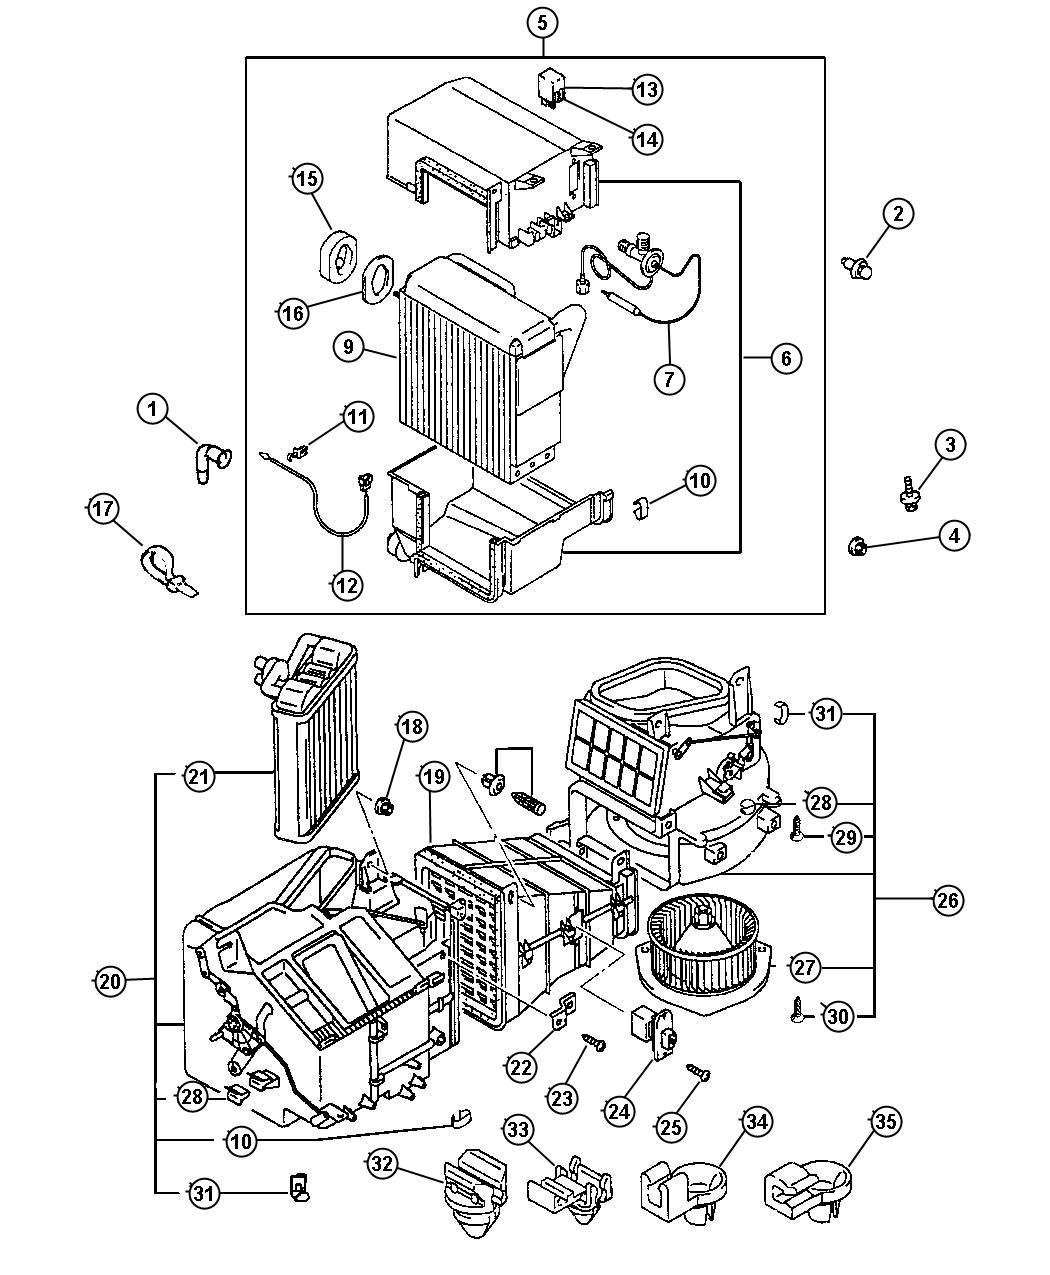 Trailer air brake system